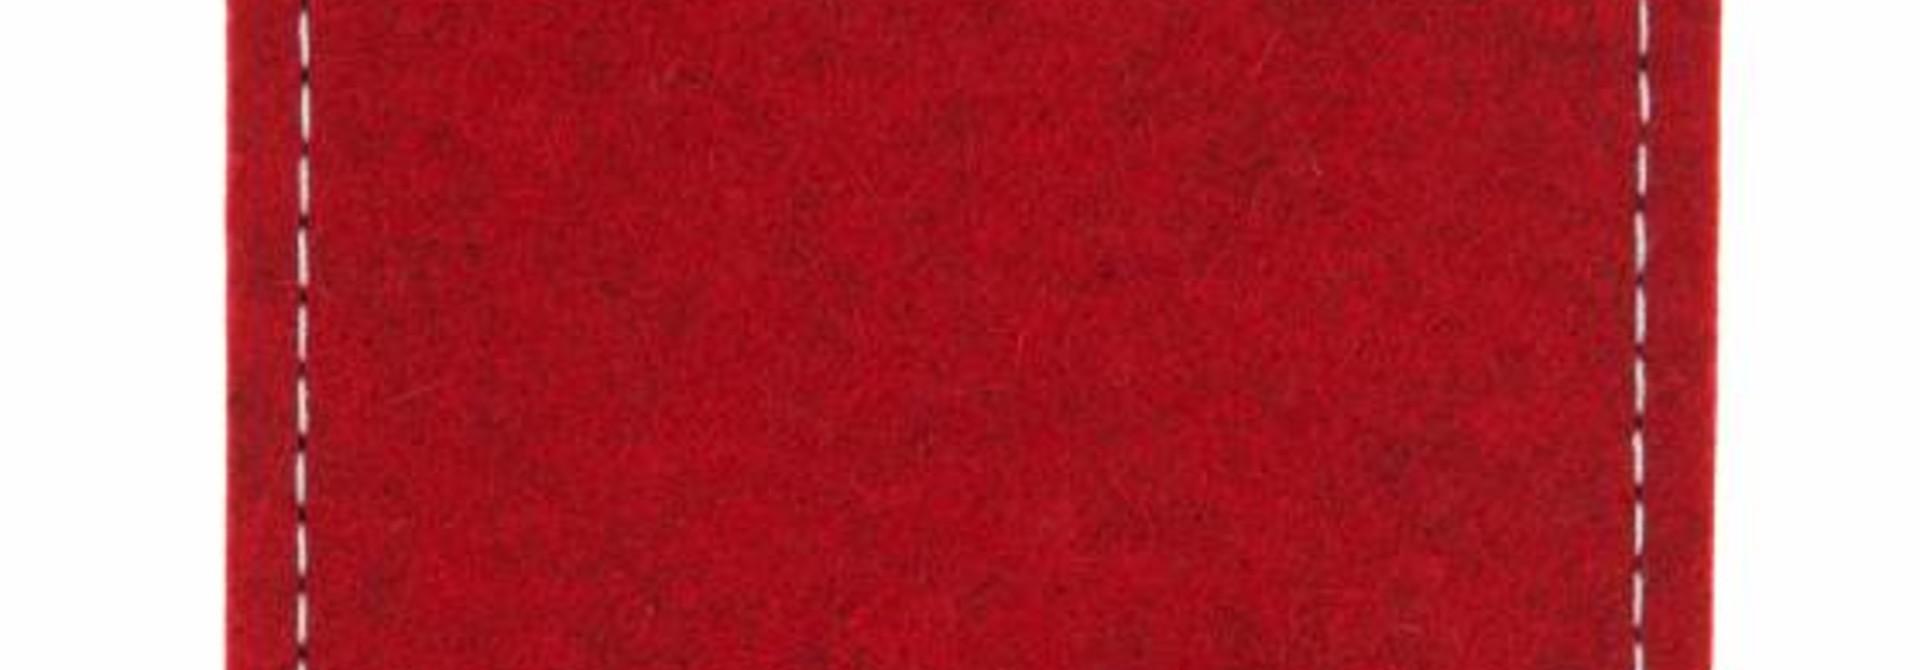 Lumia Sleeve Cherry